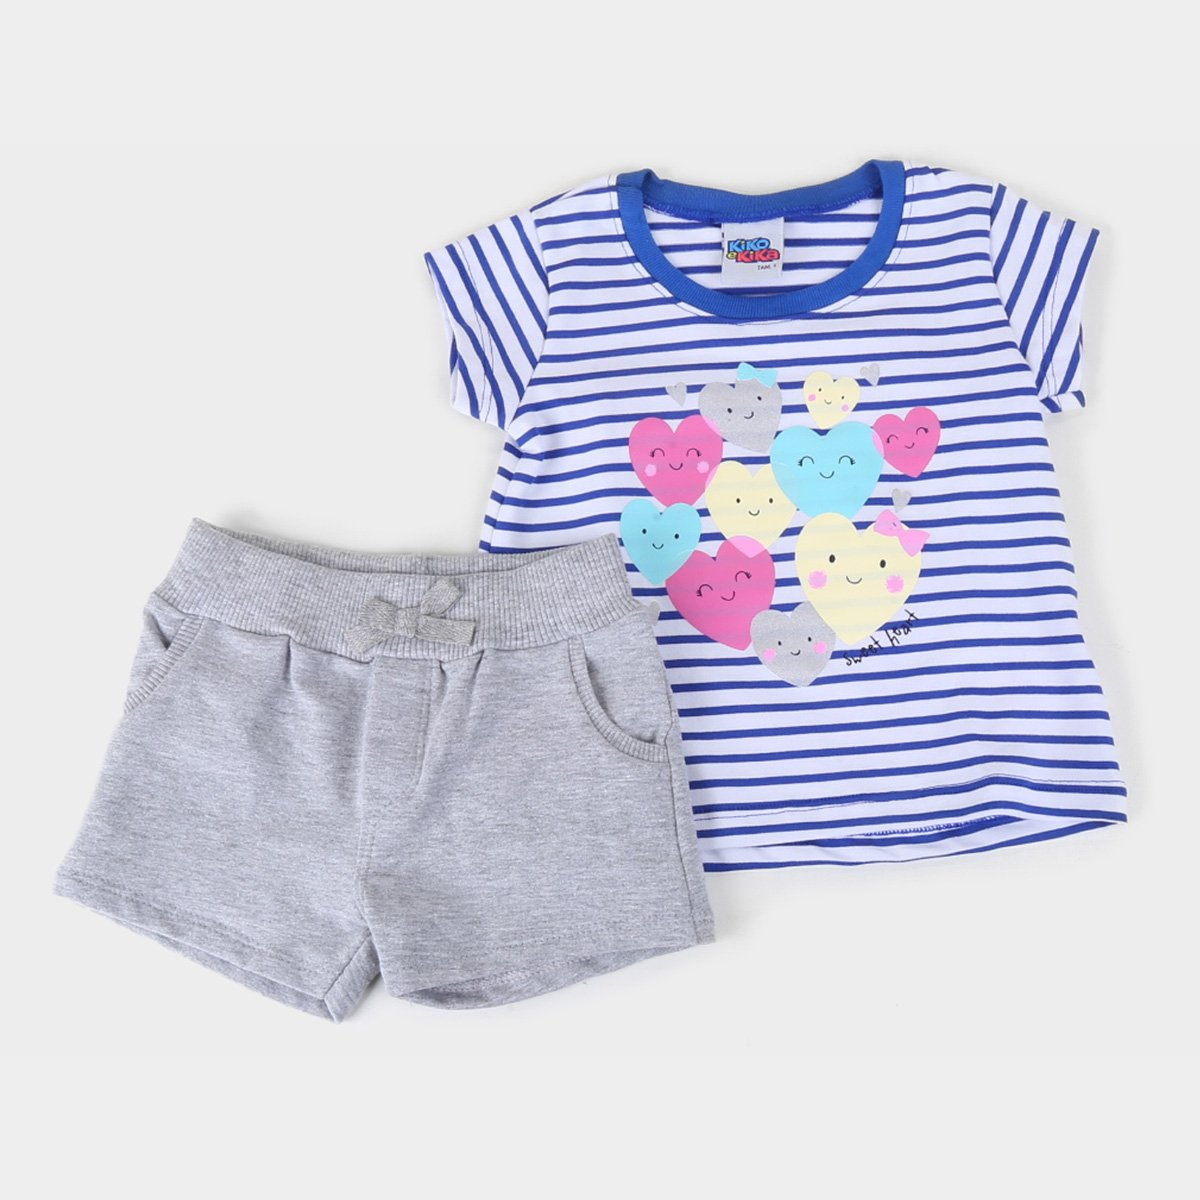 Conjunto Infantil Kiko & Kika Blusa E Shorts Molecotton Listrado Feminino